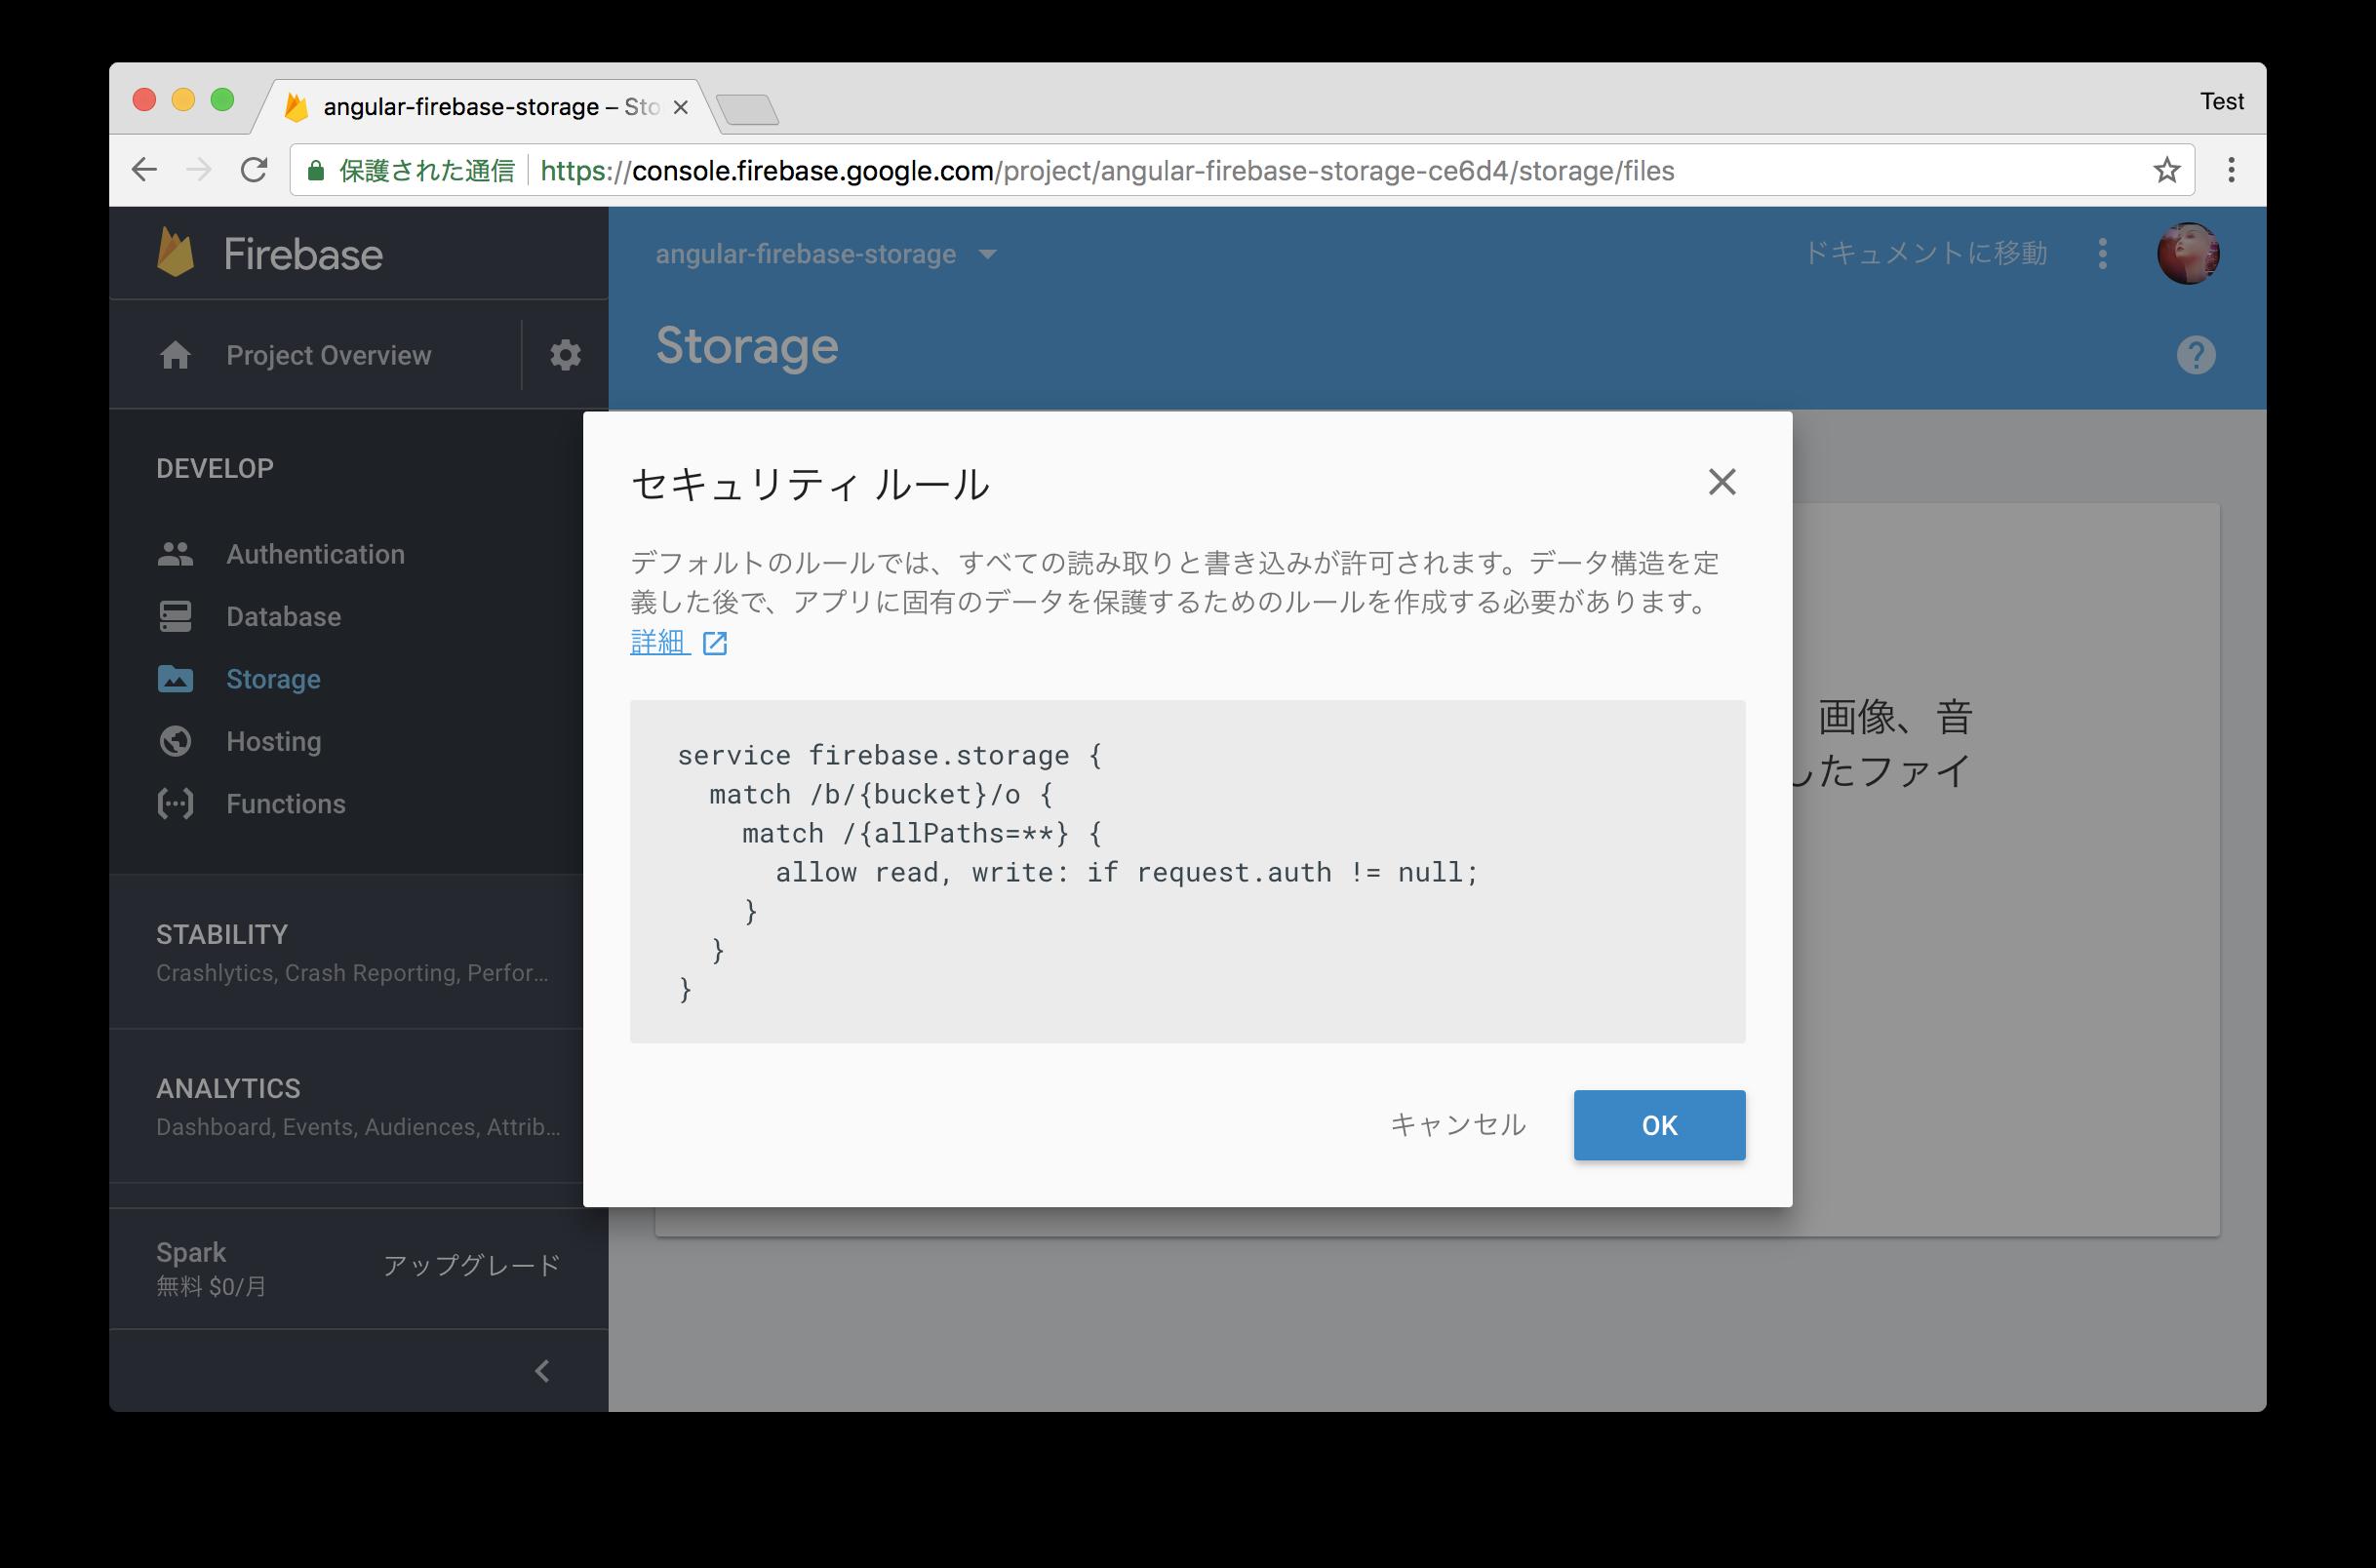 storage_02.png